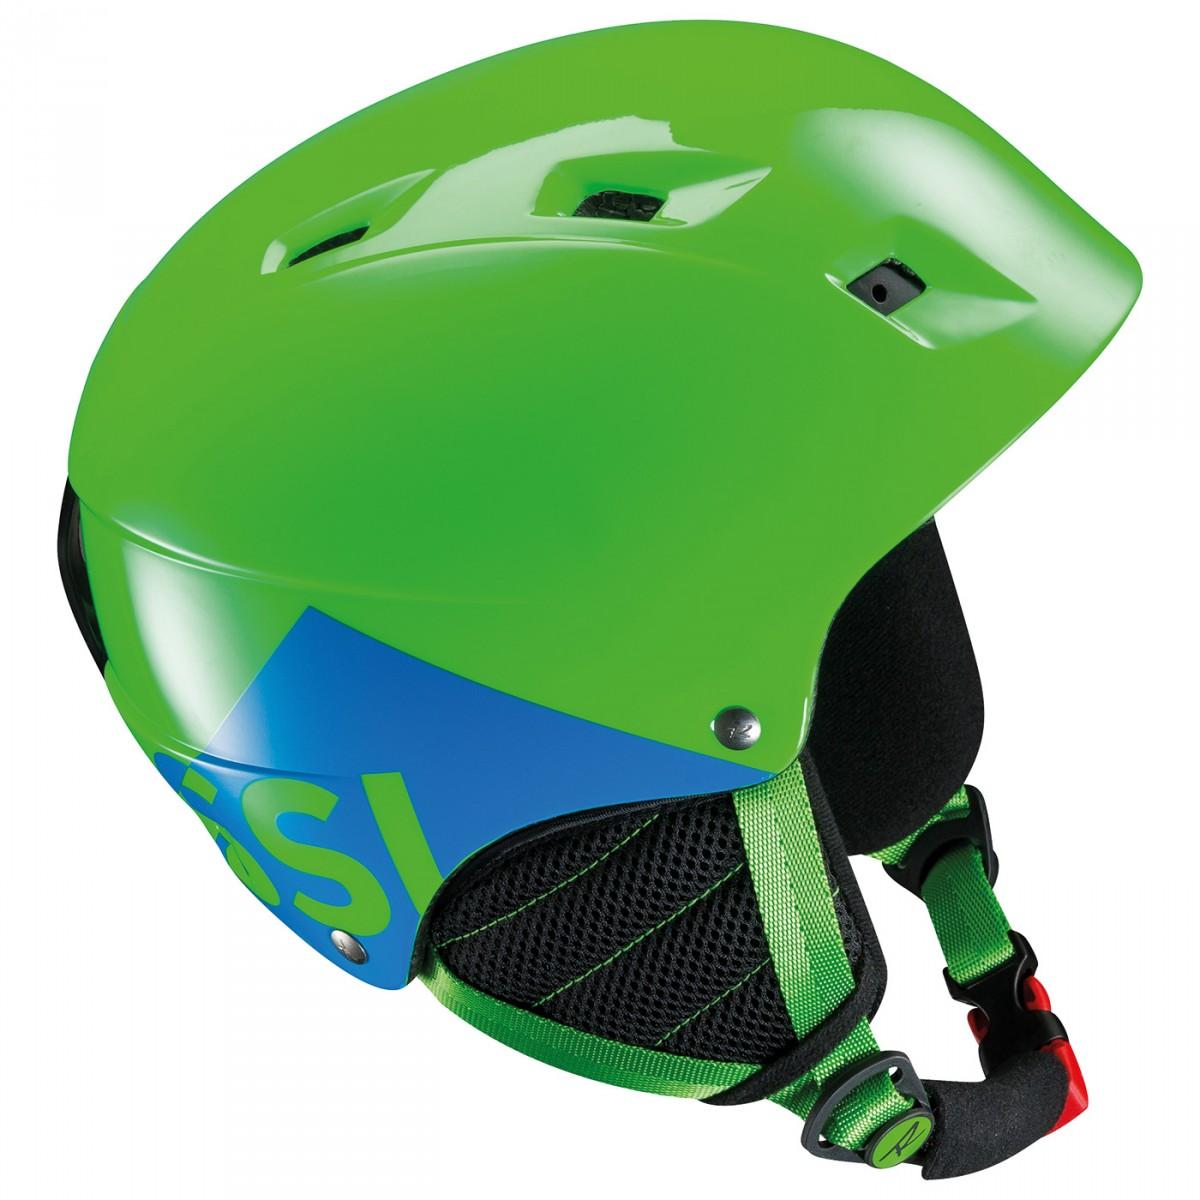 Casco sci Rossignol Comp J (Colore: verde, Taglia: 53/56)